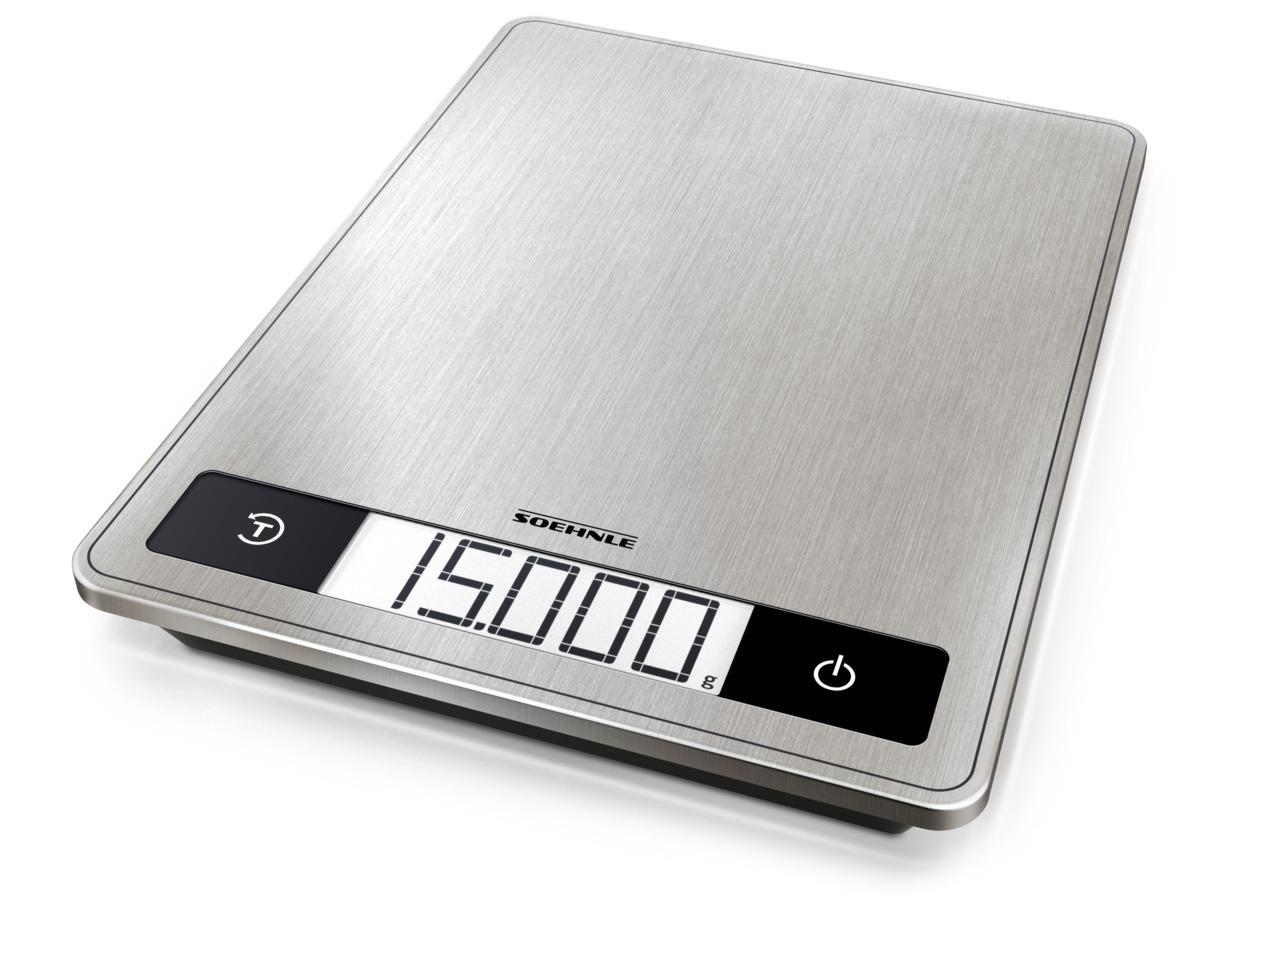 Soehnle Italia S.r.l. Tipo di display  LCD - Profi200 Bilancia da cucina digitale digitale